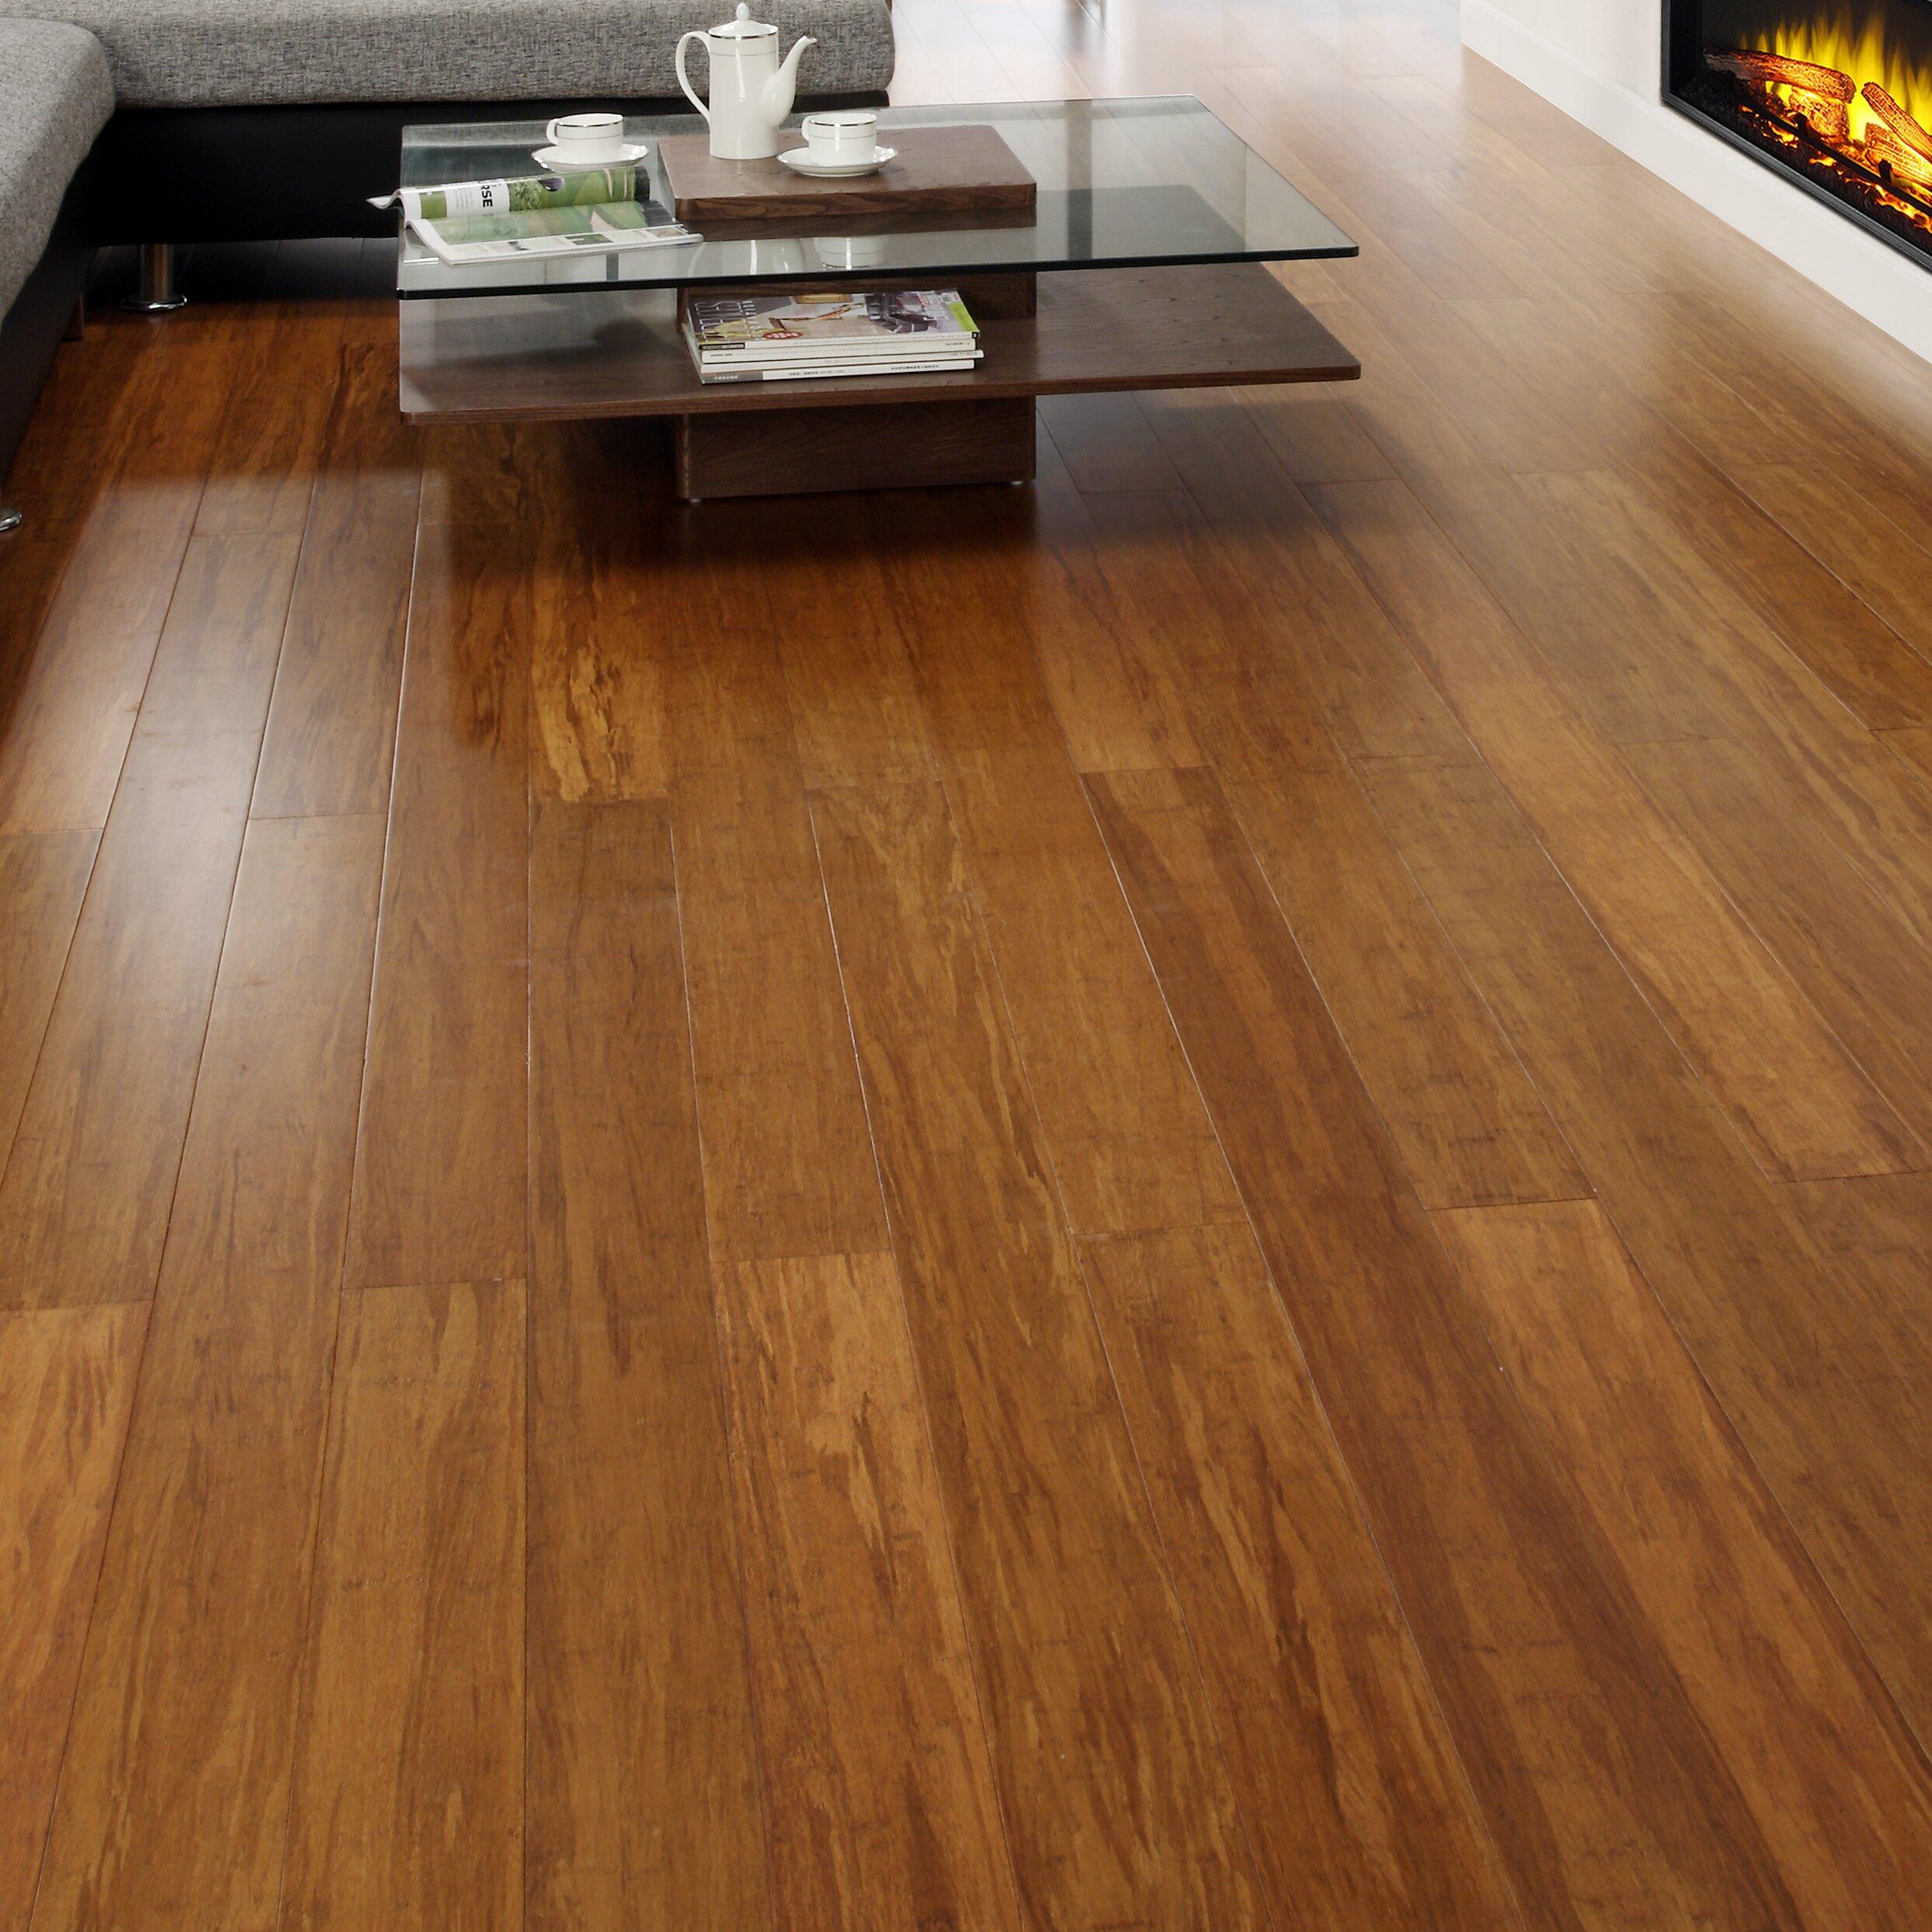 5 engineered strand woven bamboo hardwood flooring in